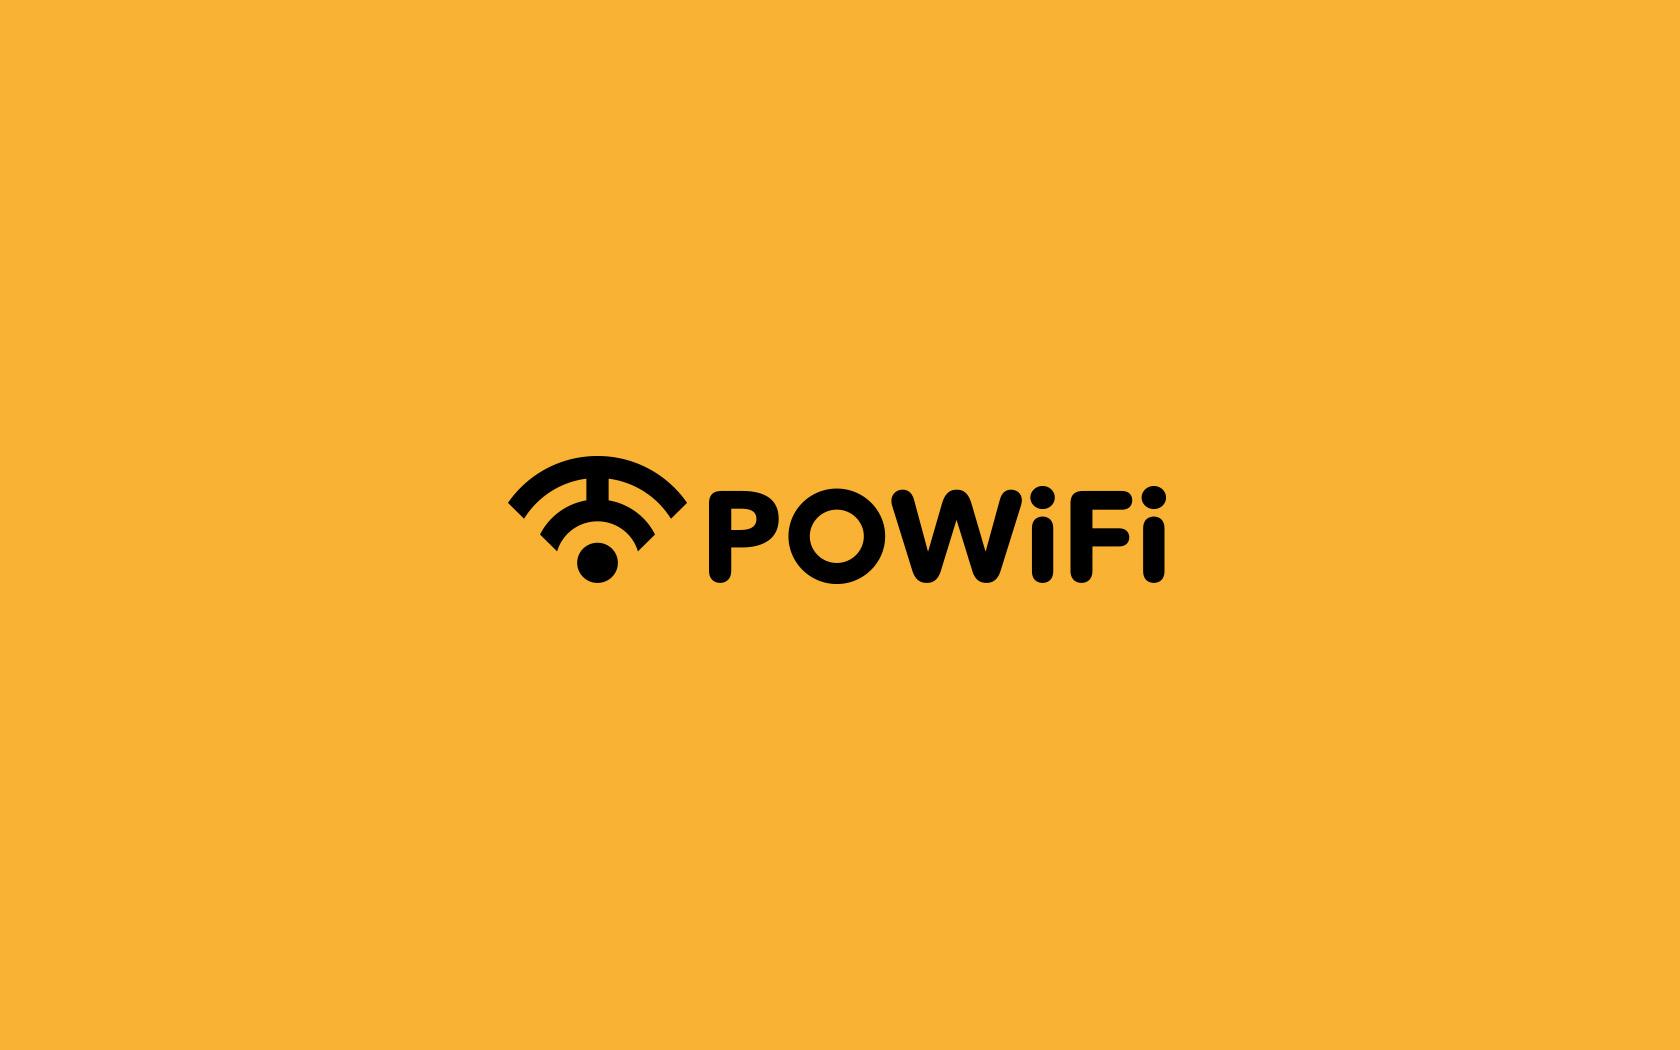 Powifi